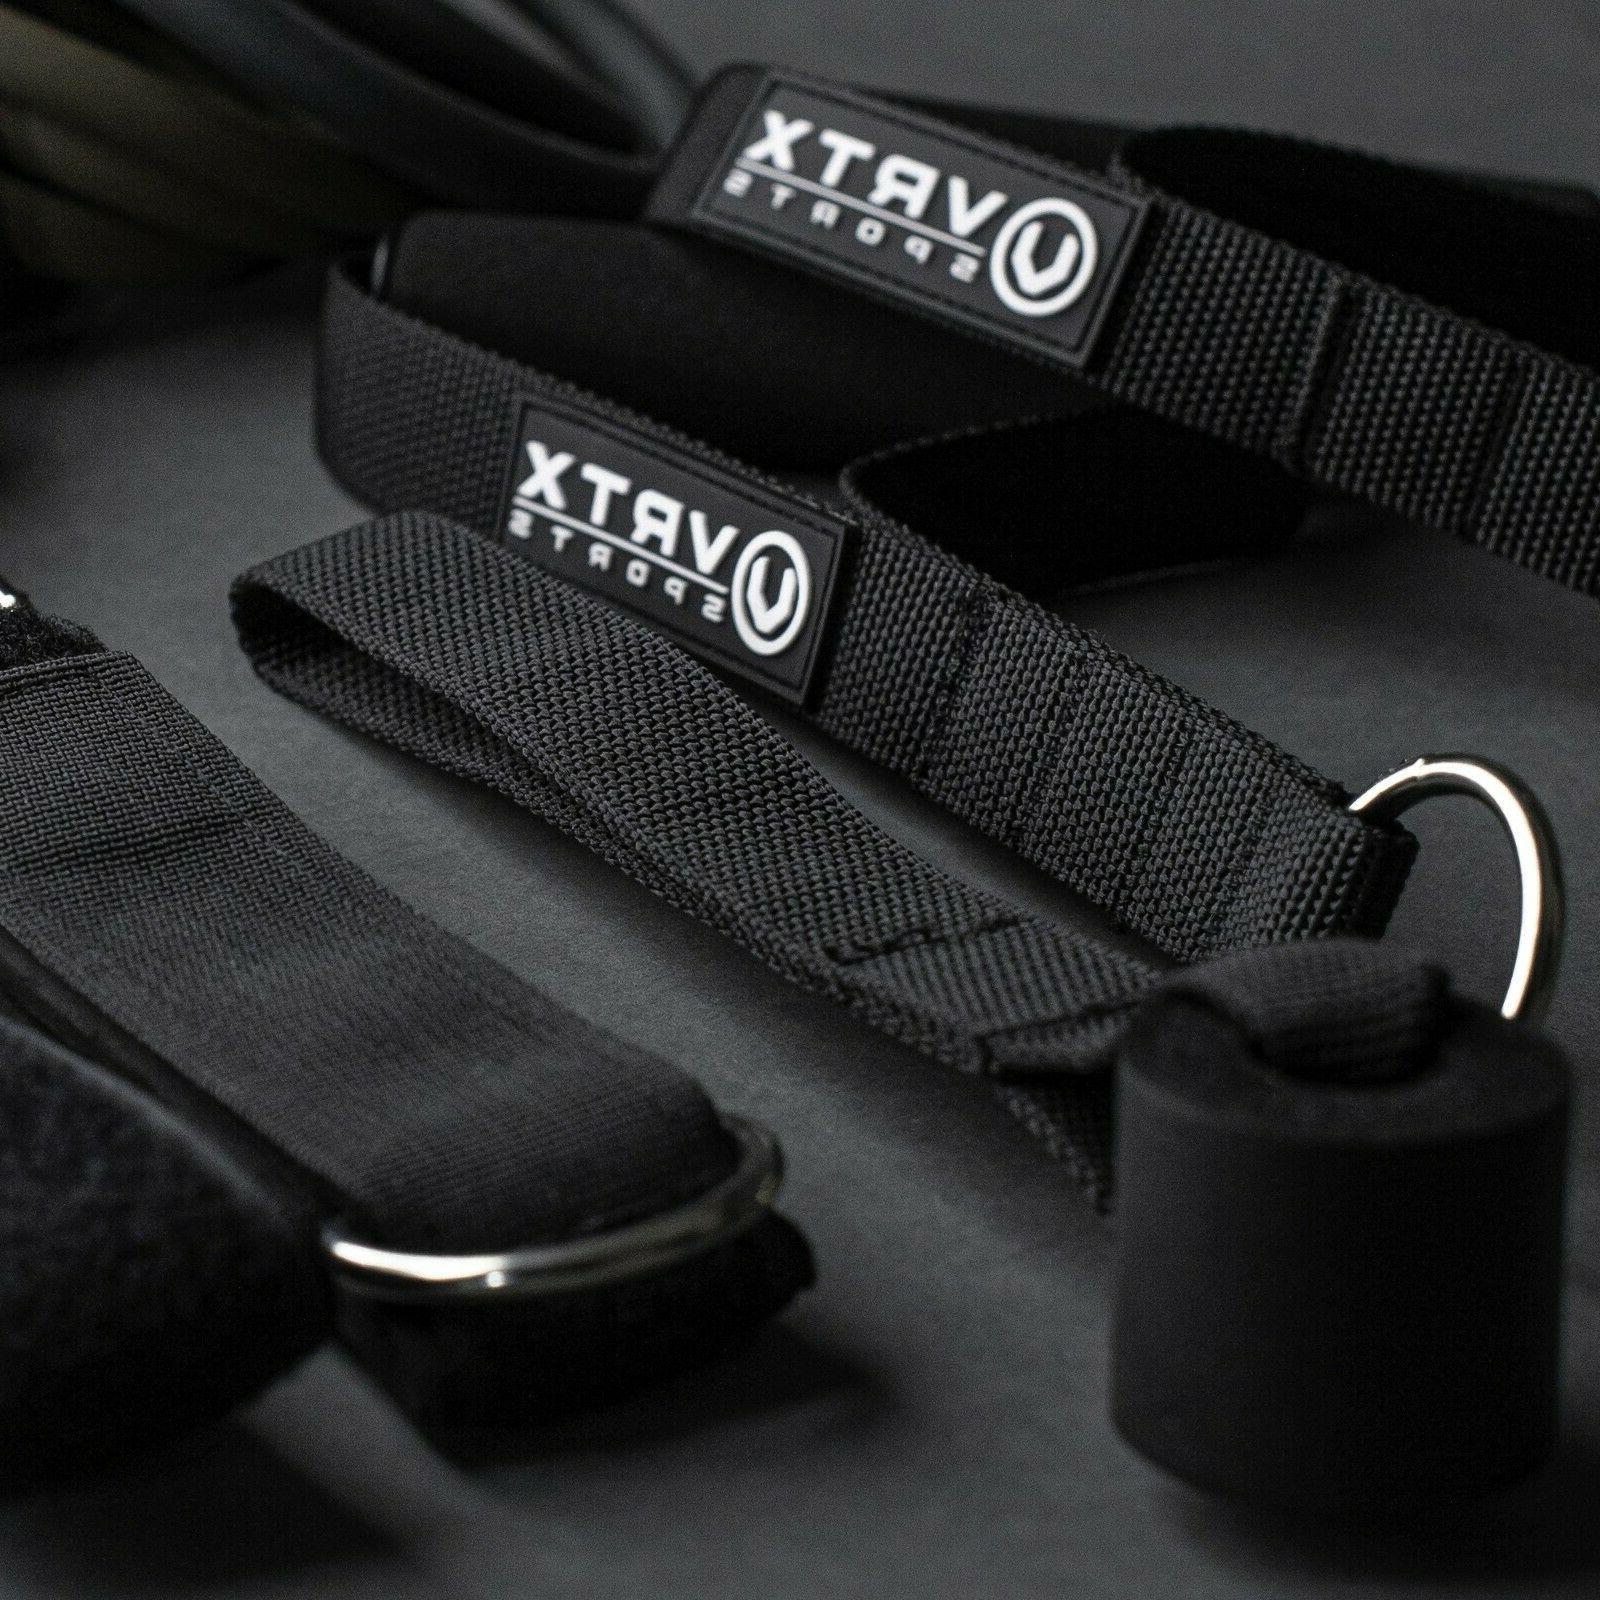 VRTX SPORTS Stackable Resistance Gym Workout